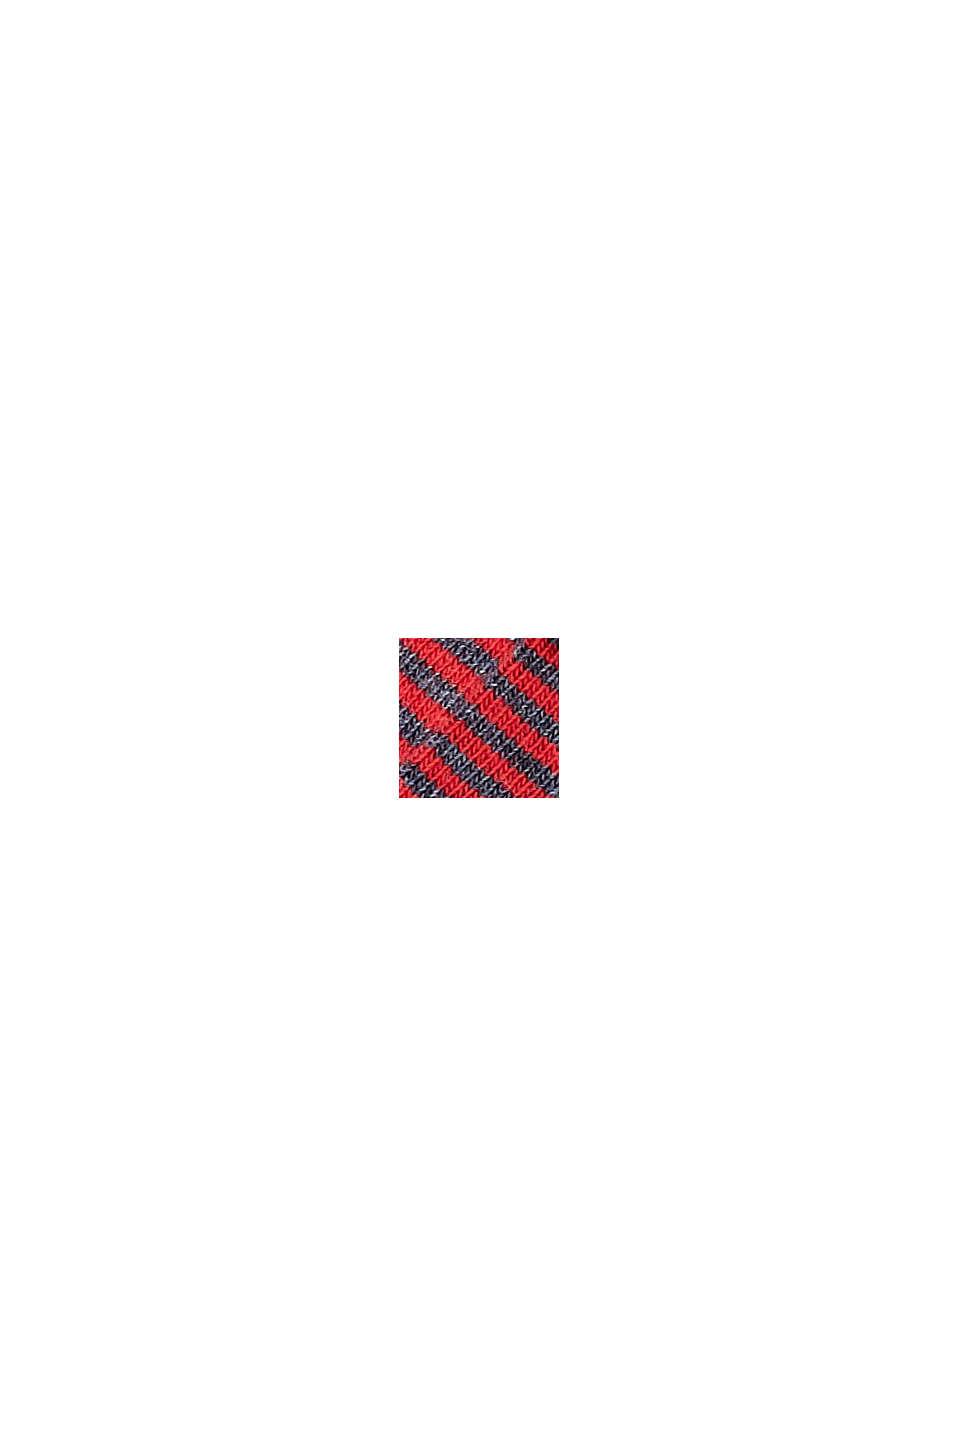 Strumpor i 2-pack, i ekobomullsmix, RED/NAVY, swatch